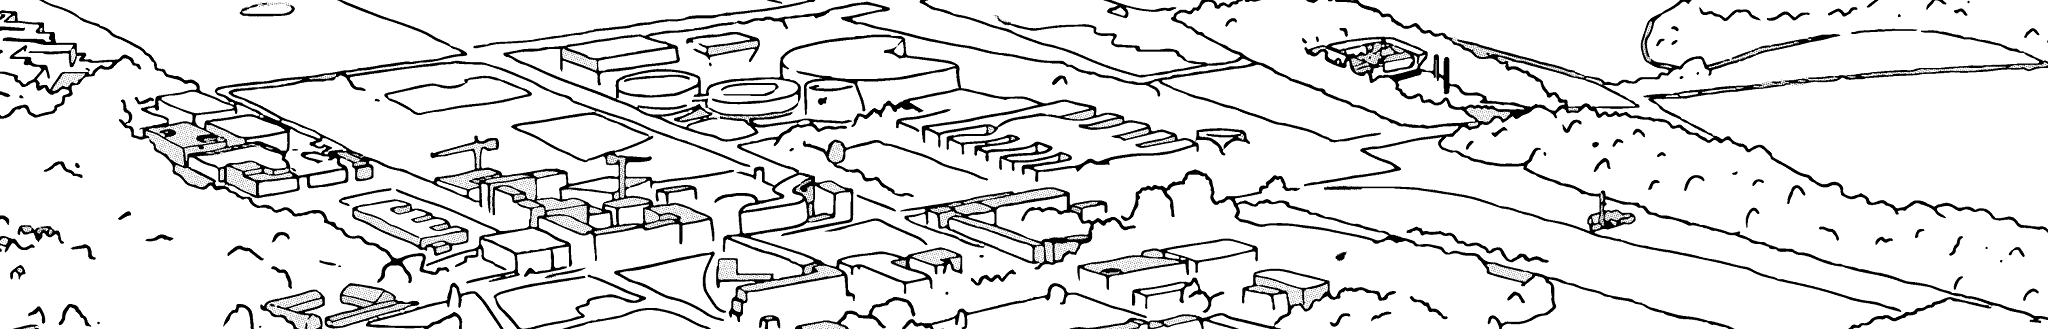 Plateau de Saclay (strip)